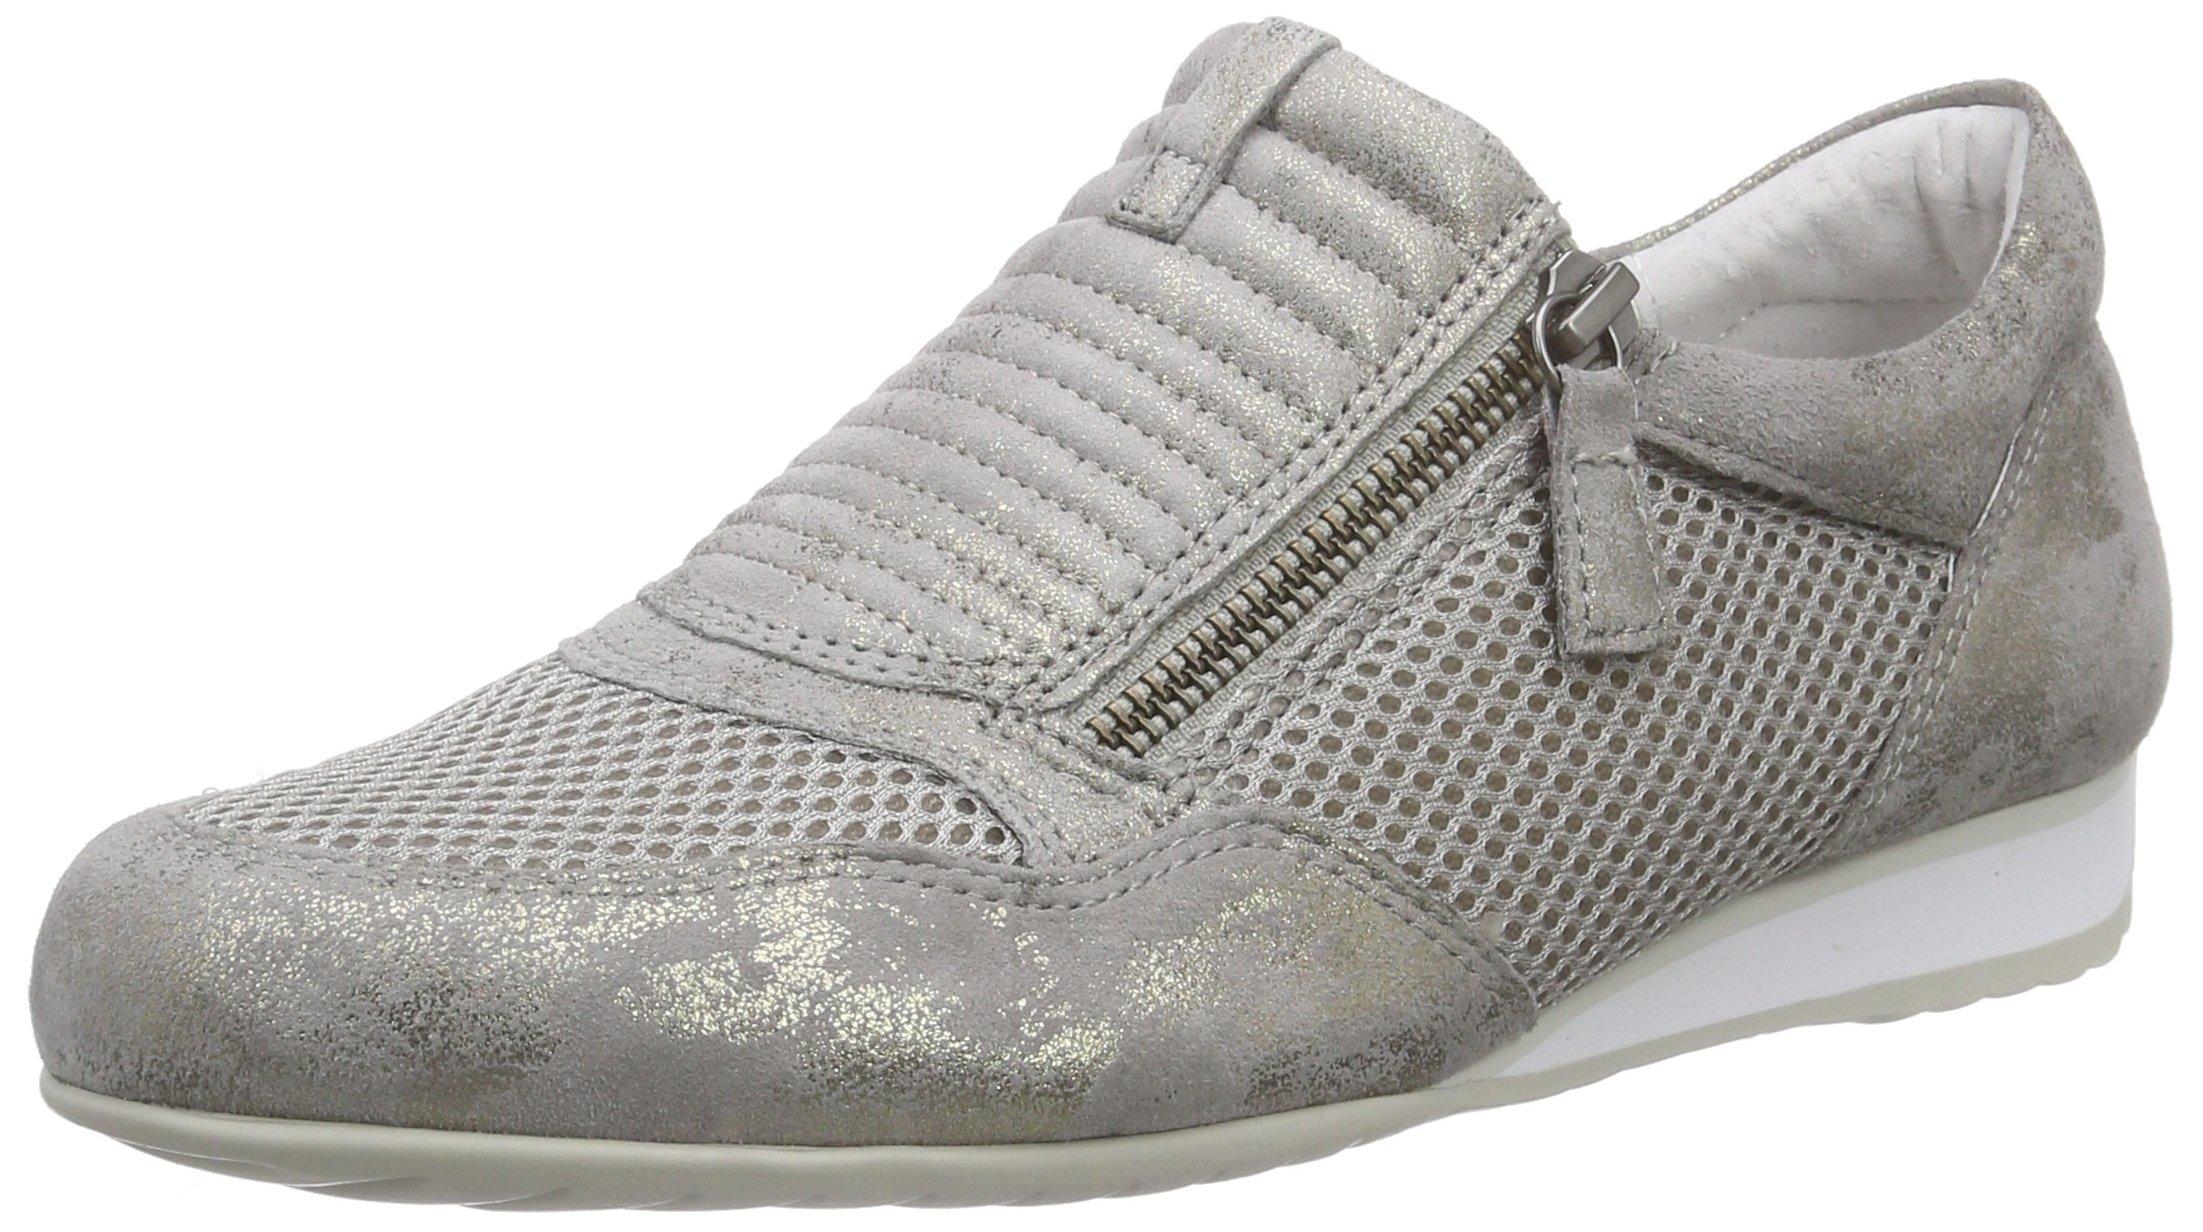 Basses Eu ComfortBaskets Gabor Shoes Taupe37 FemmeBeige93 435RjqAL